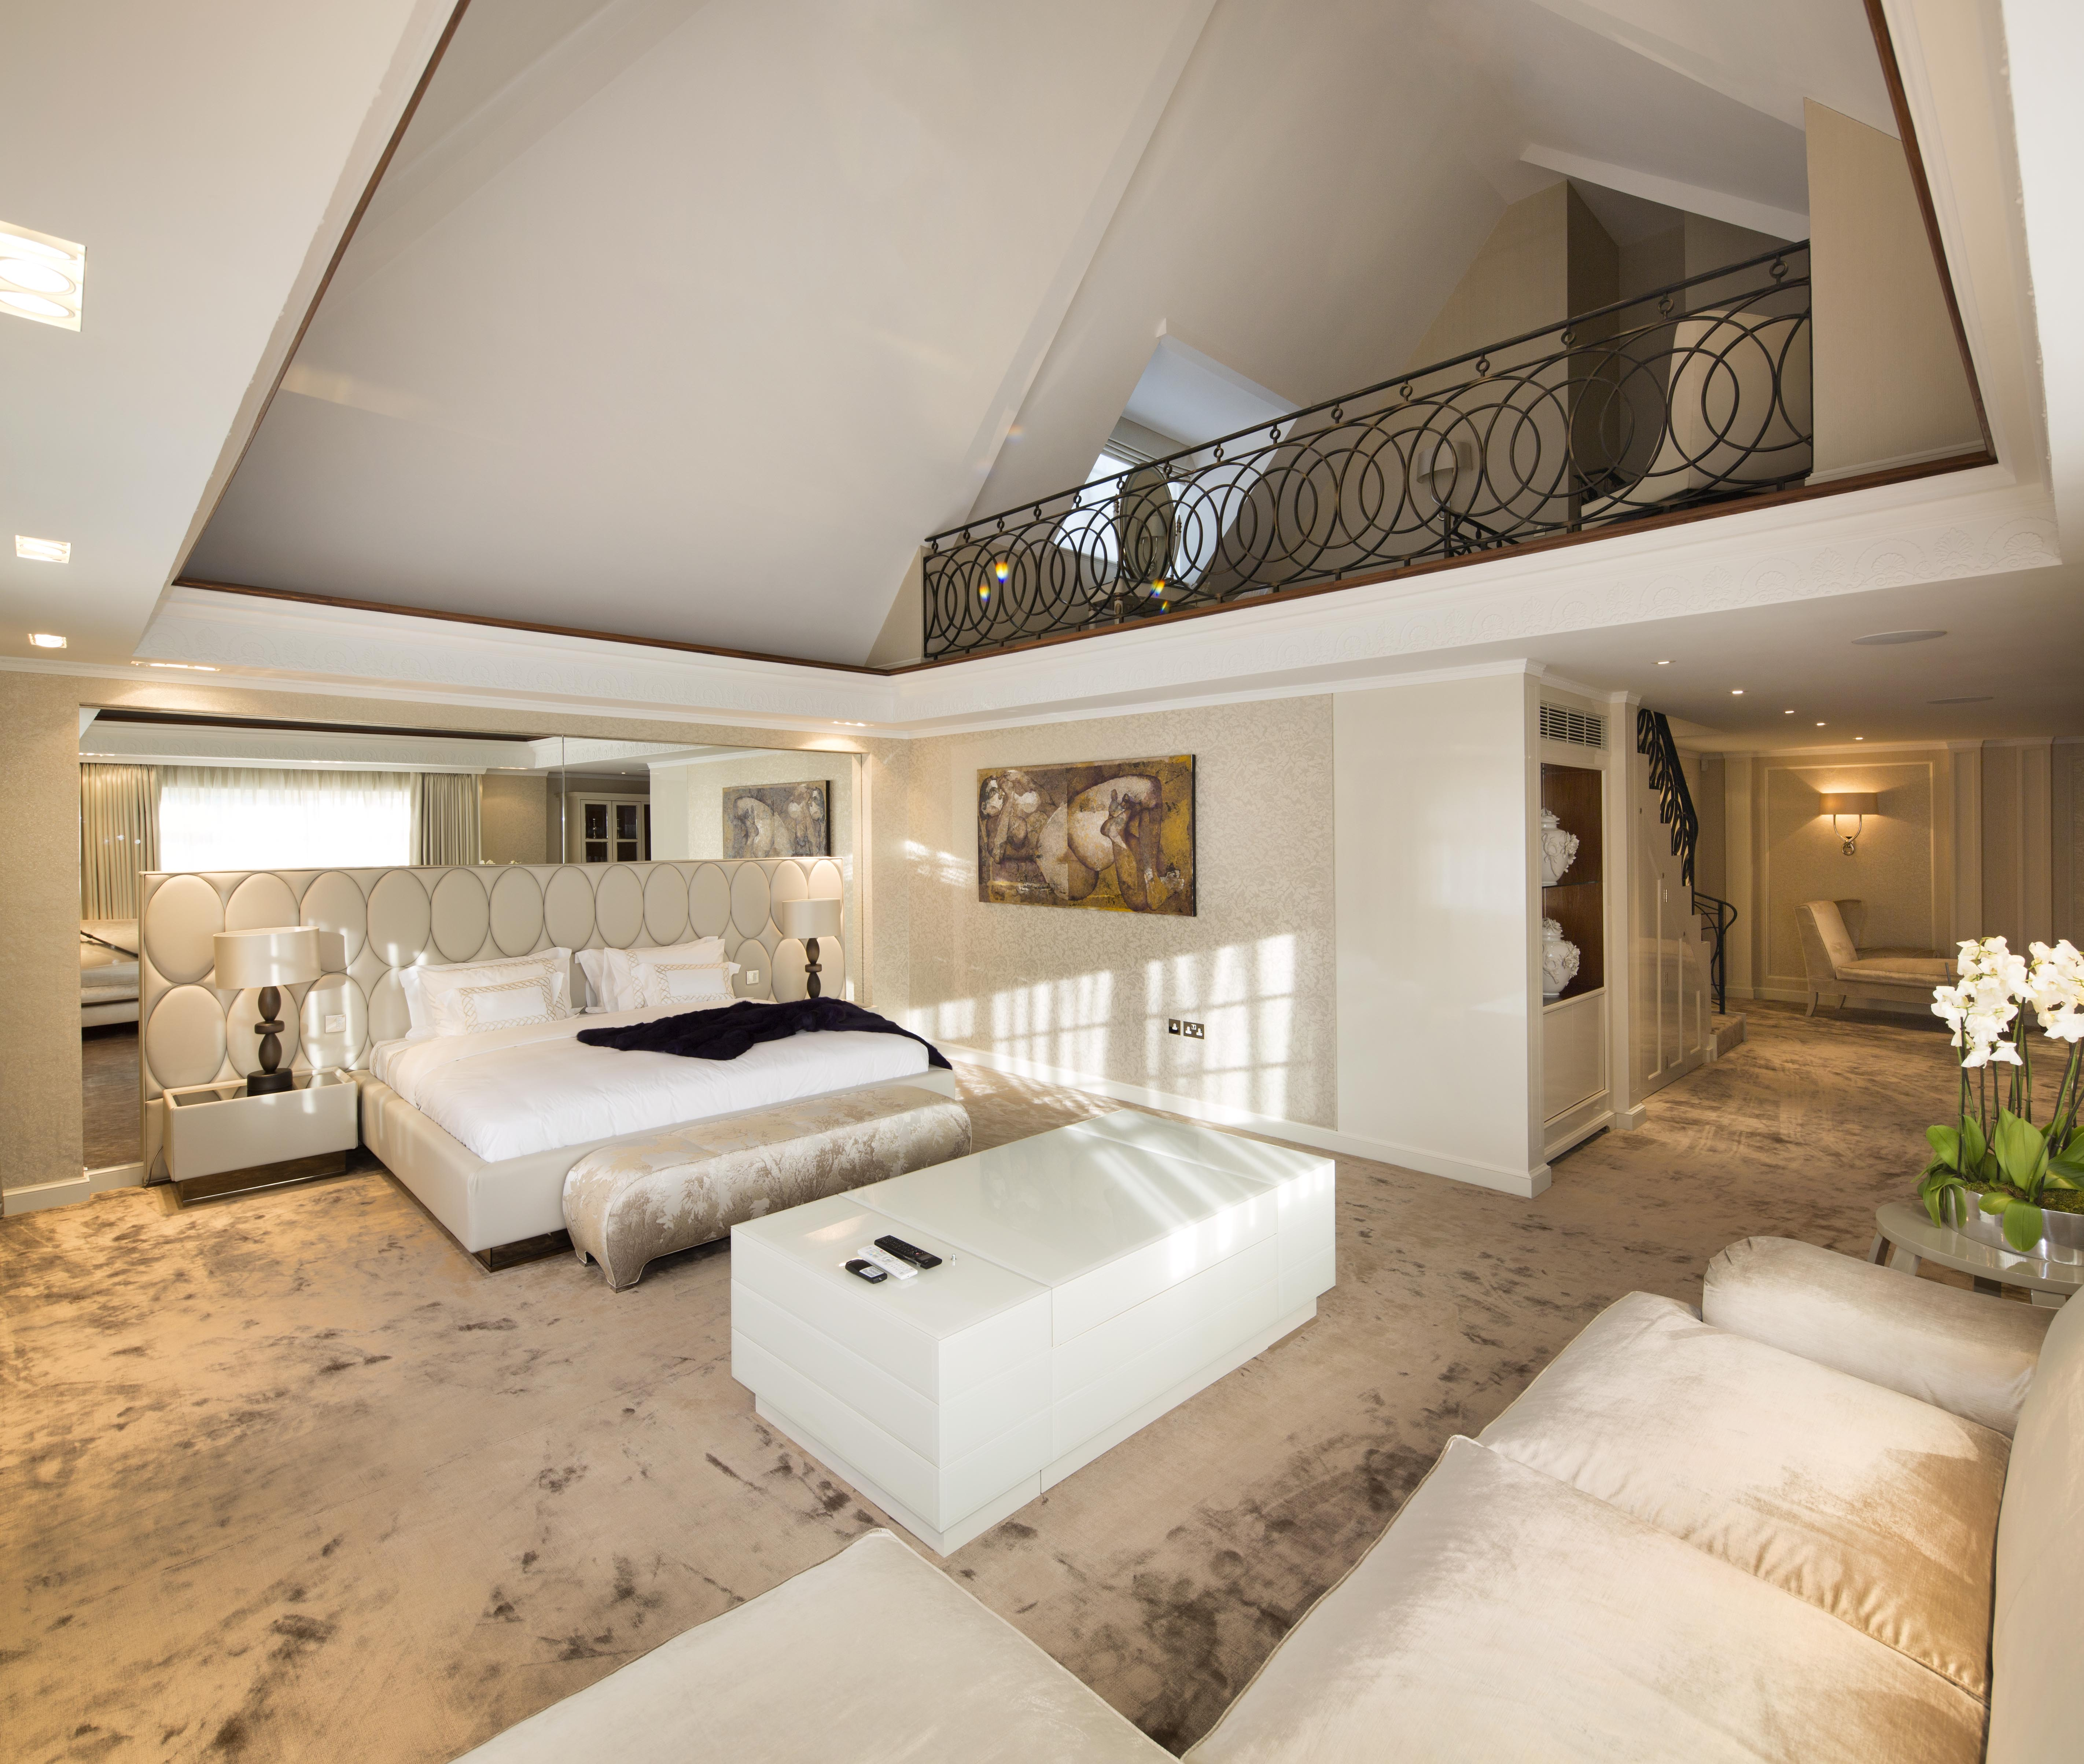 Sumptuous master bedroom suite with mezzanine level - ISG